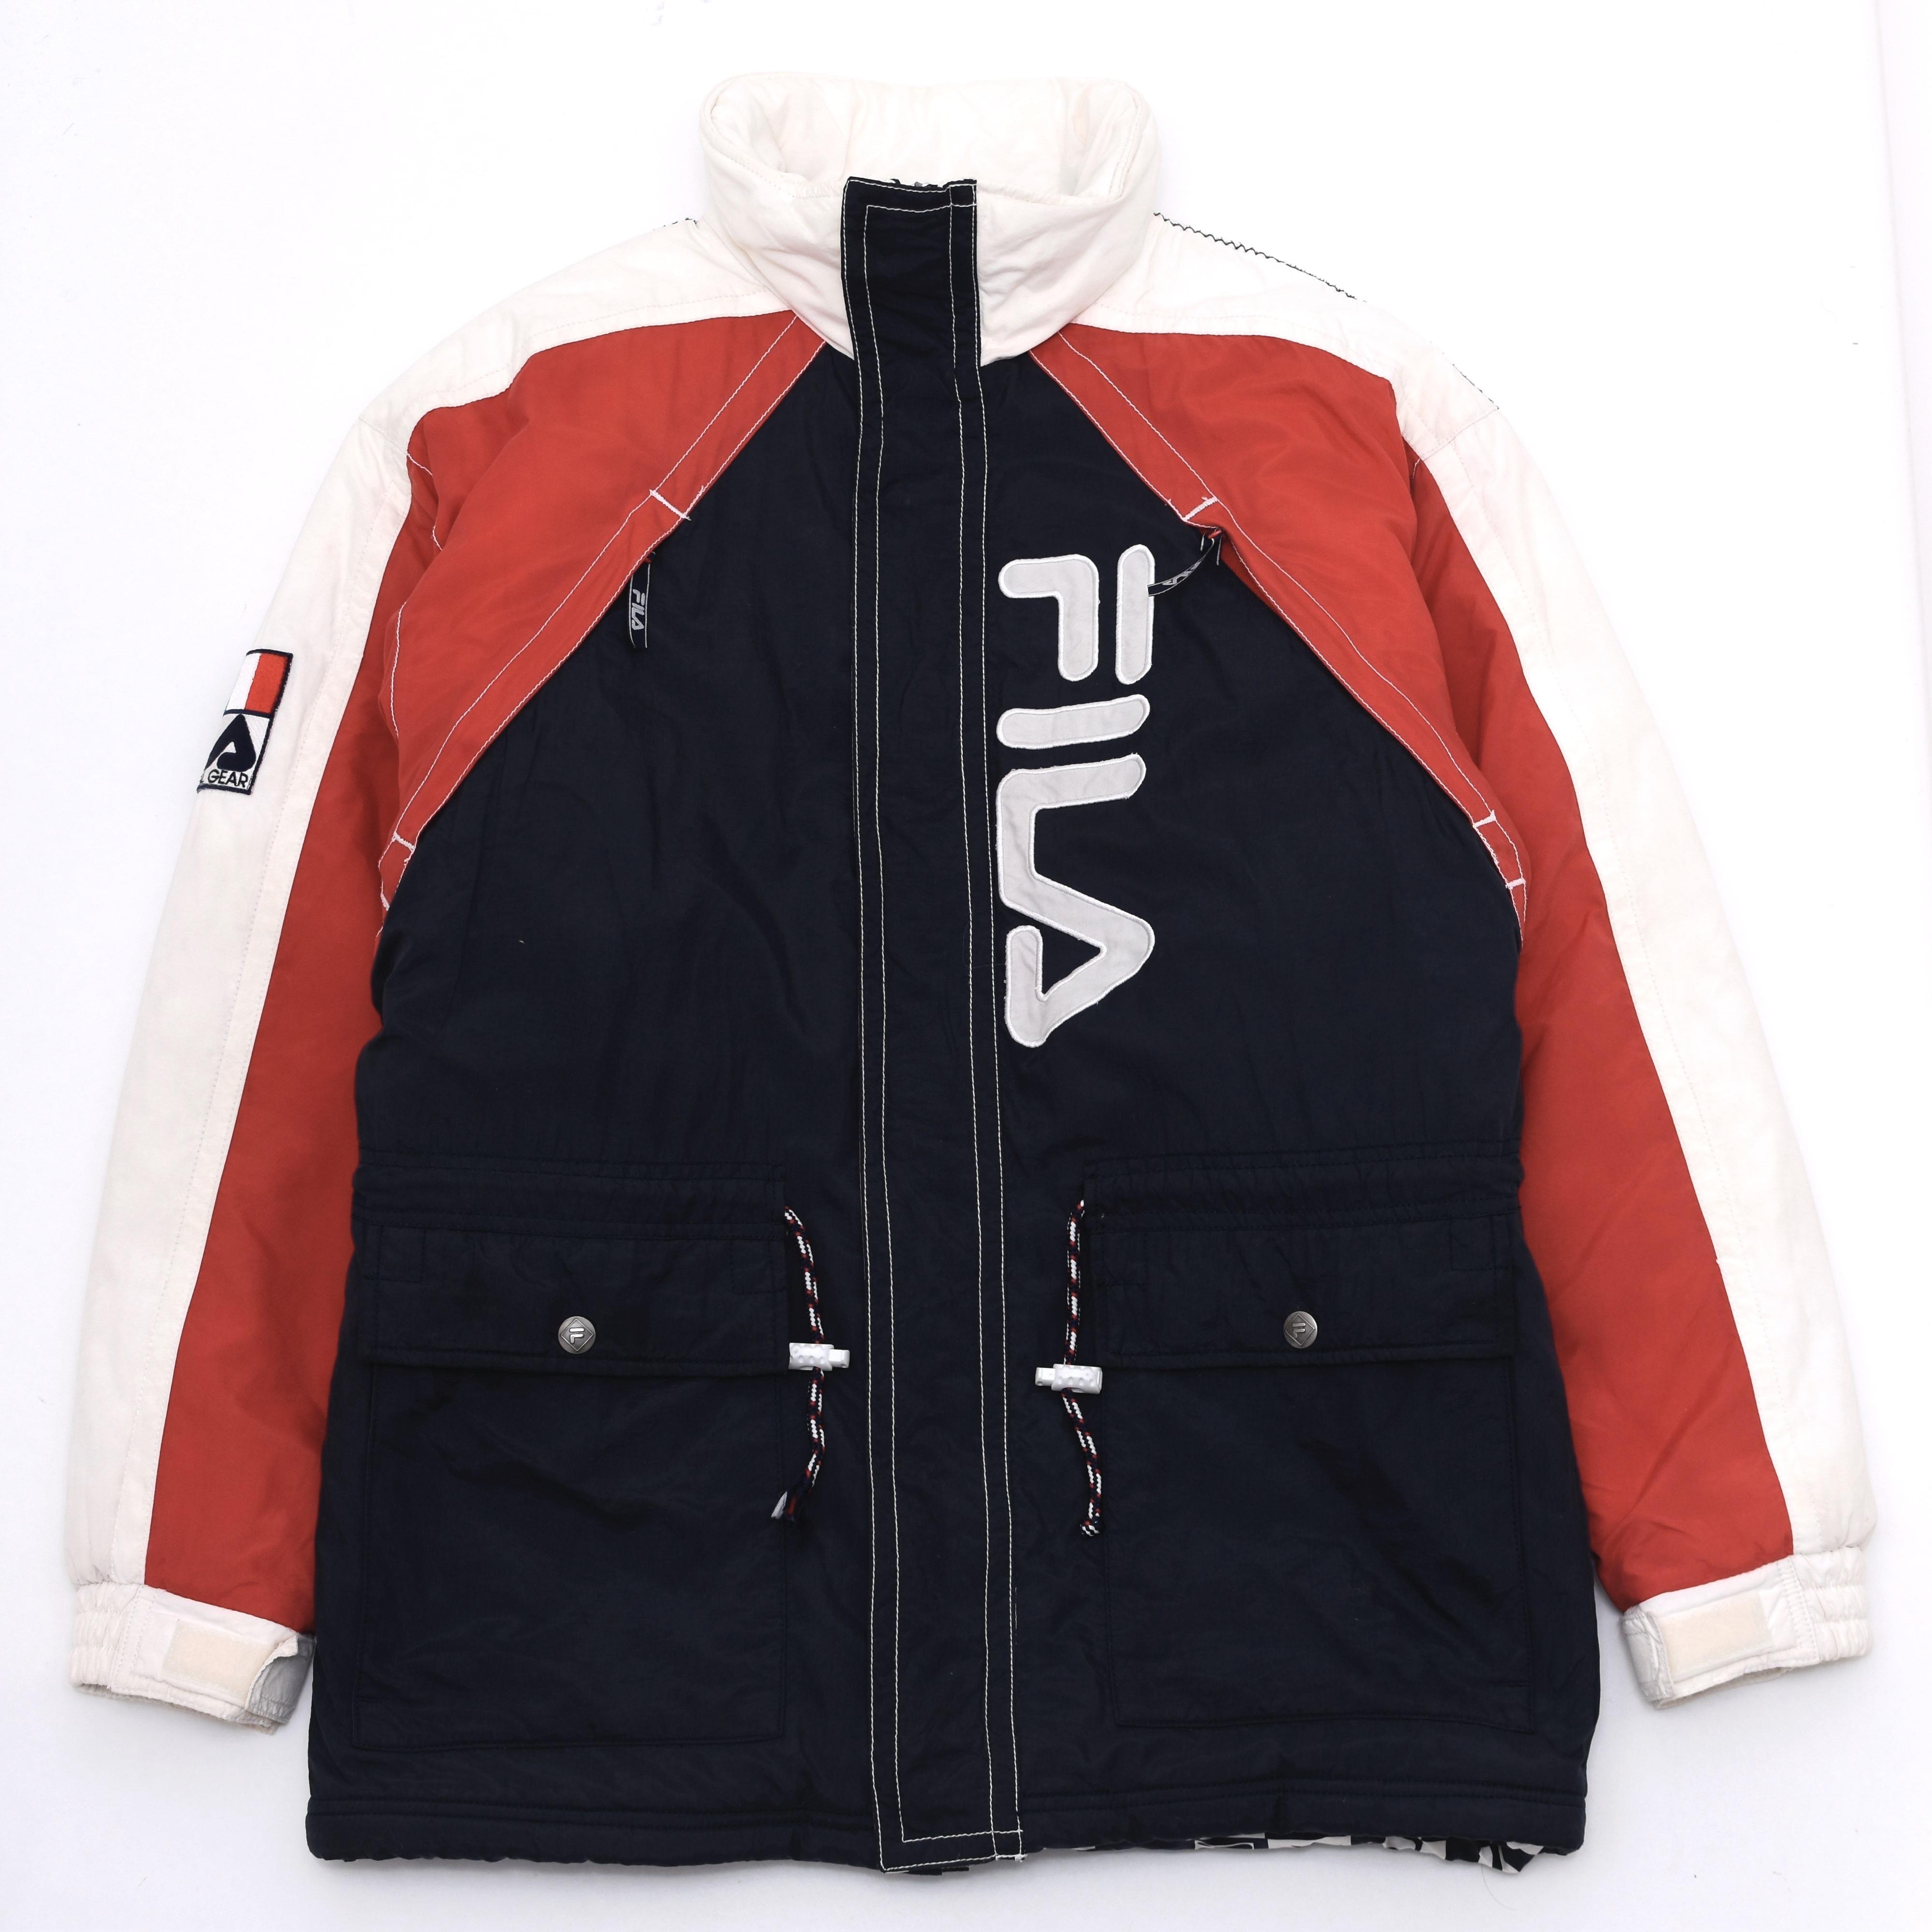 90's FILA international gear nylo jacket